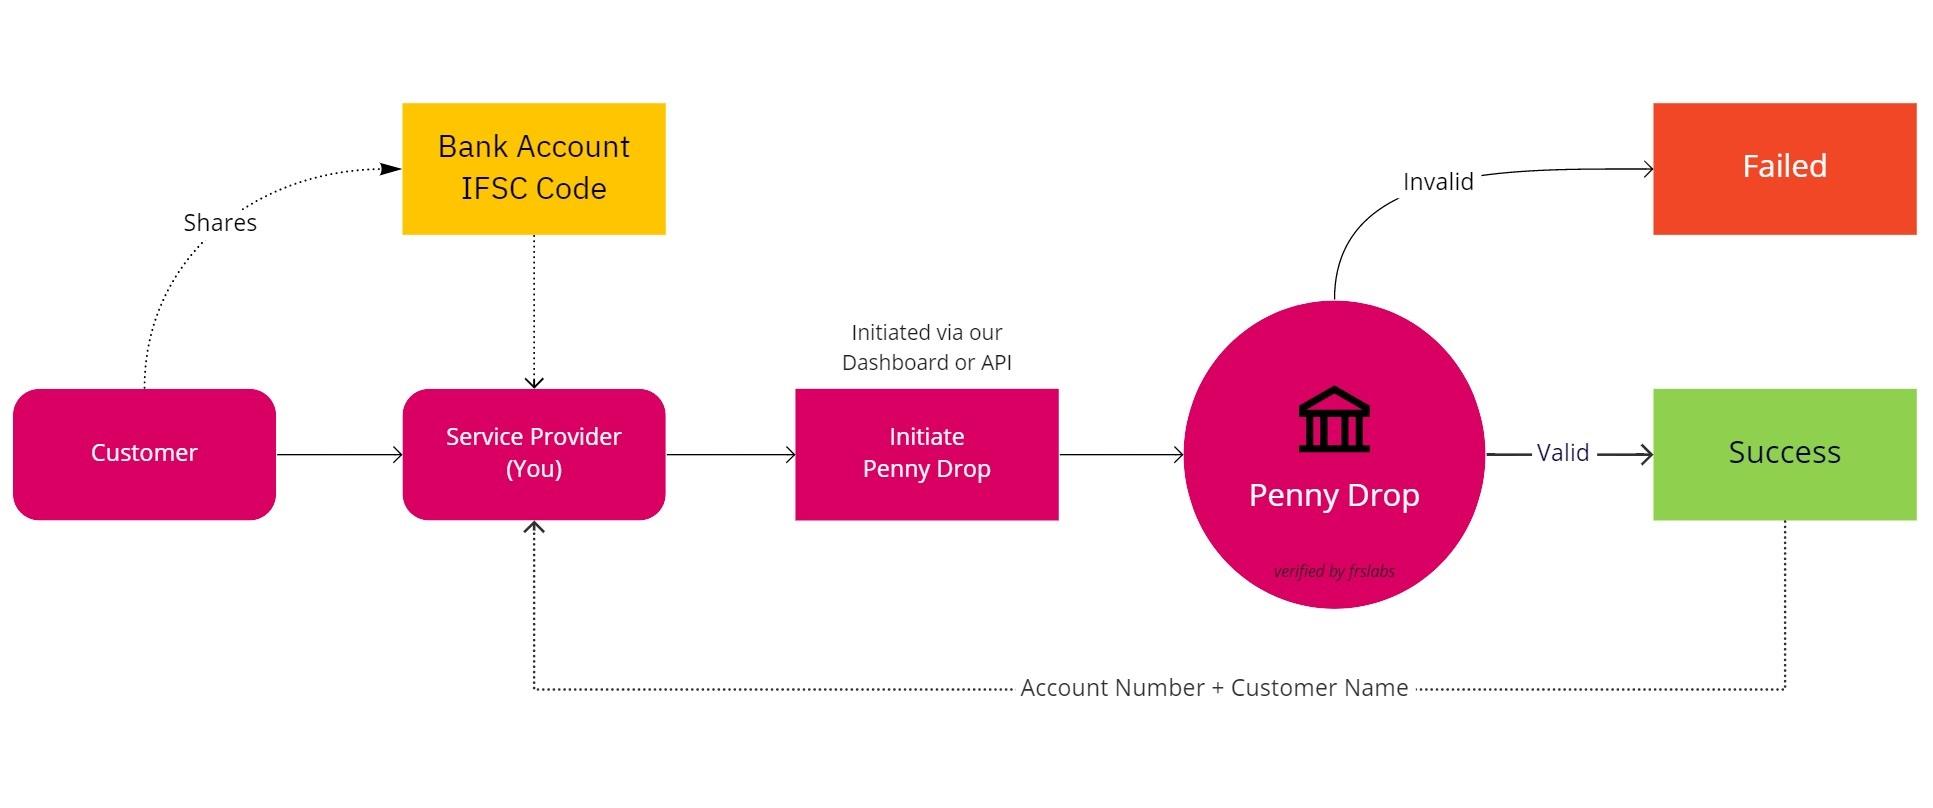 Penny Drop Verification